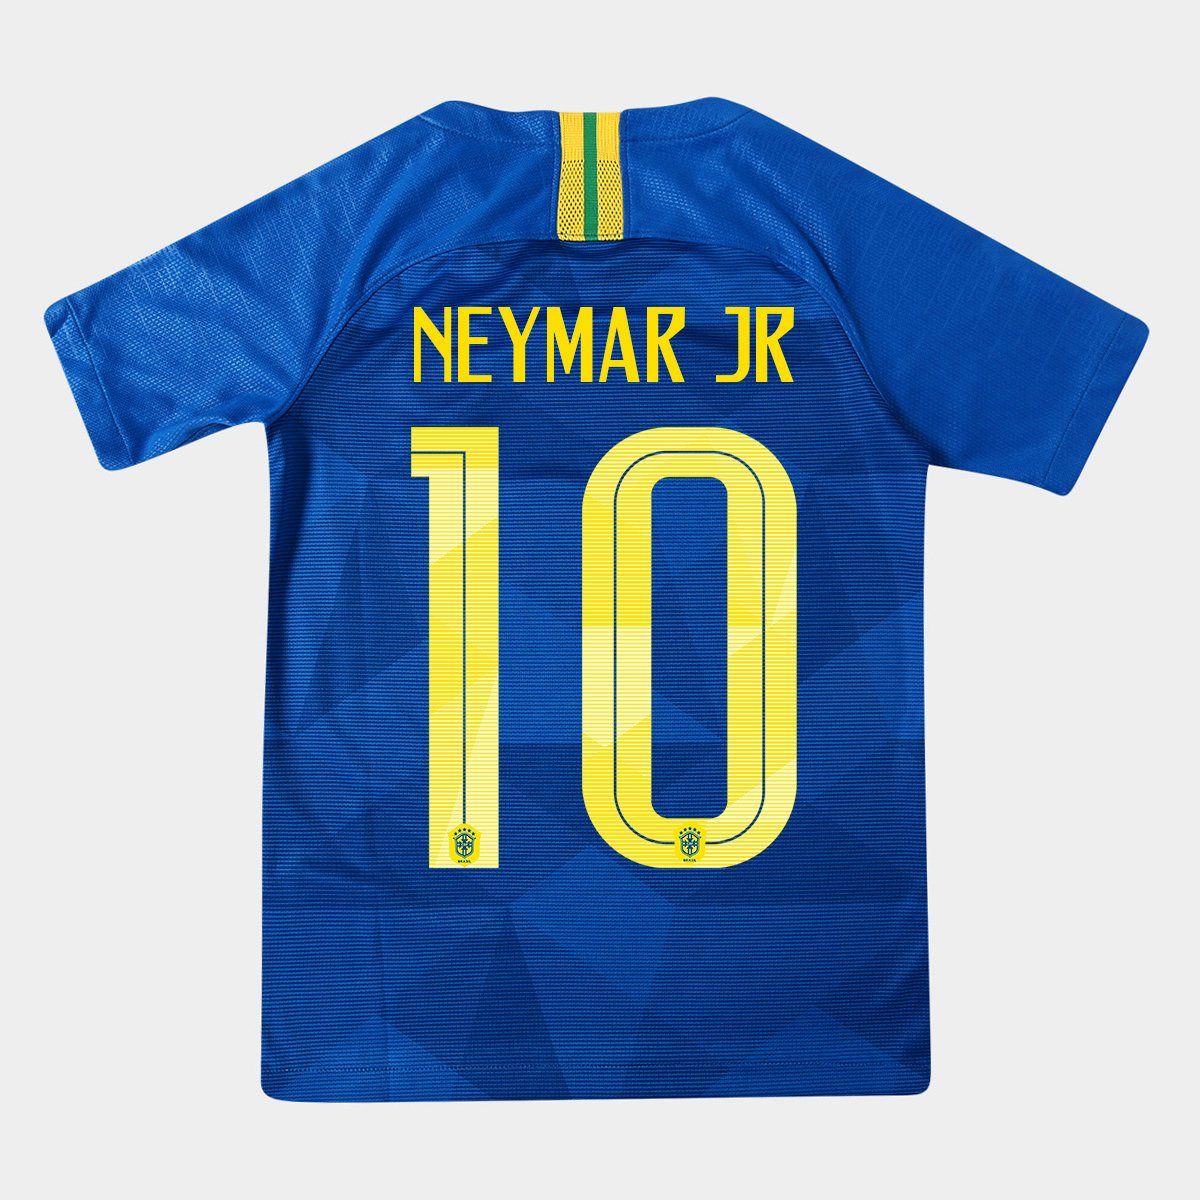 83300884d Camisa Seleção Brasil Juvenil II 2018 nº 10 Neymar Jr - Torcedor Nike -  Compre Agora